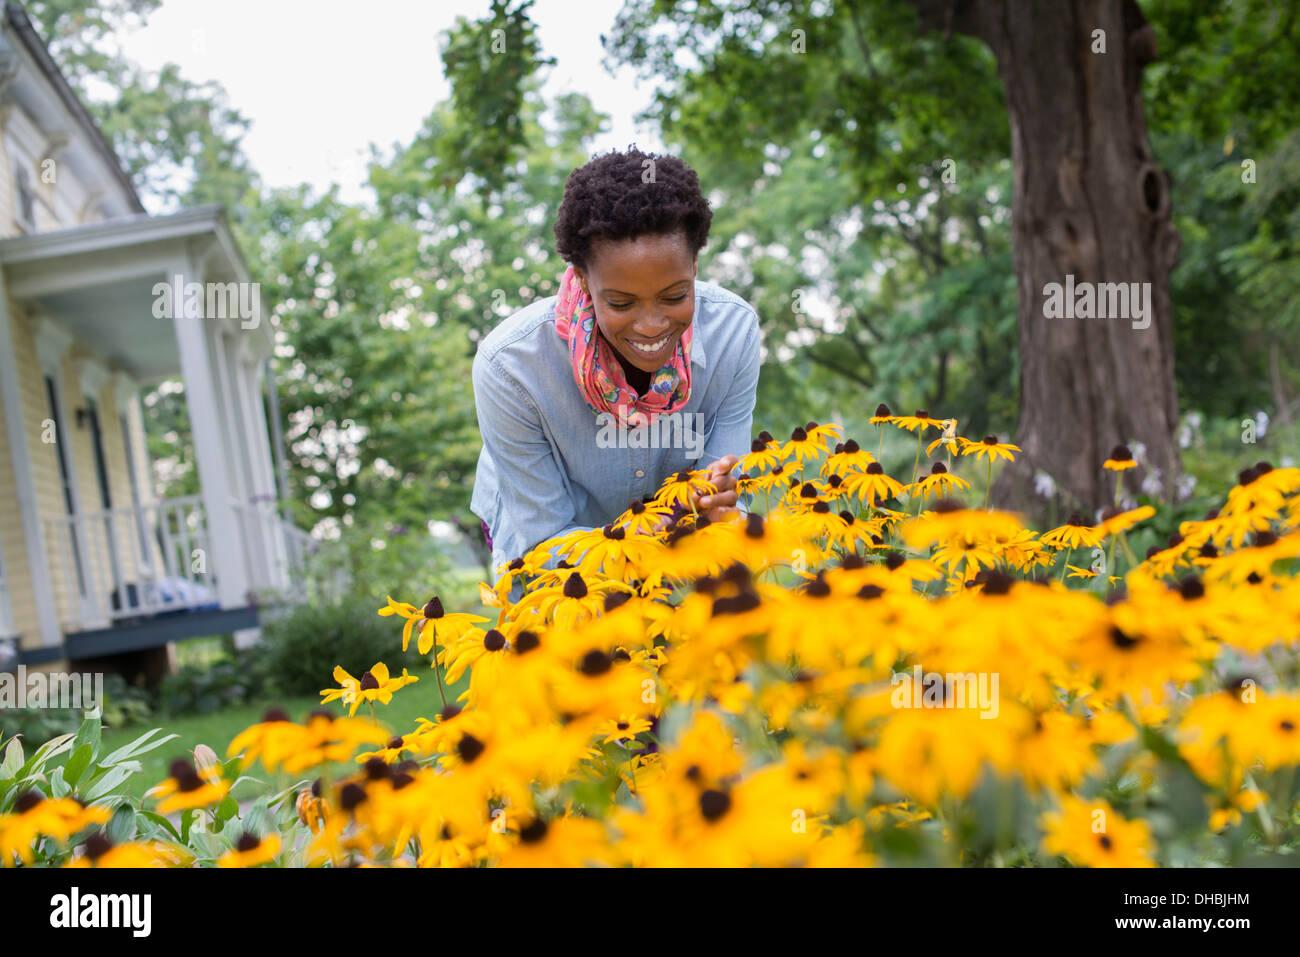 An organic flower garden. A woman bending to cut tall yellow rudbekia flowers. Stock Photo